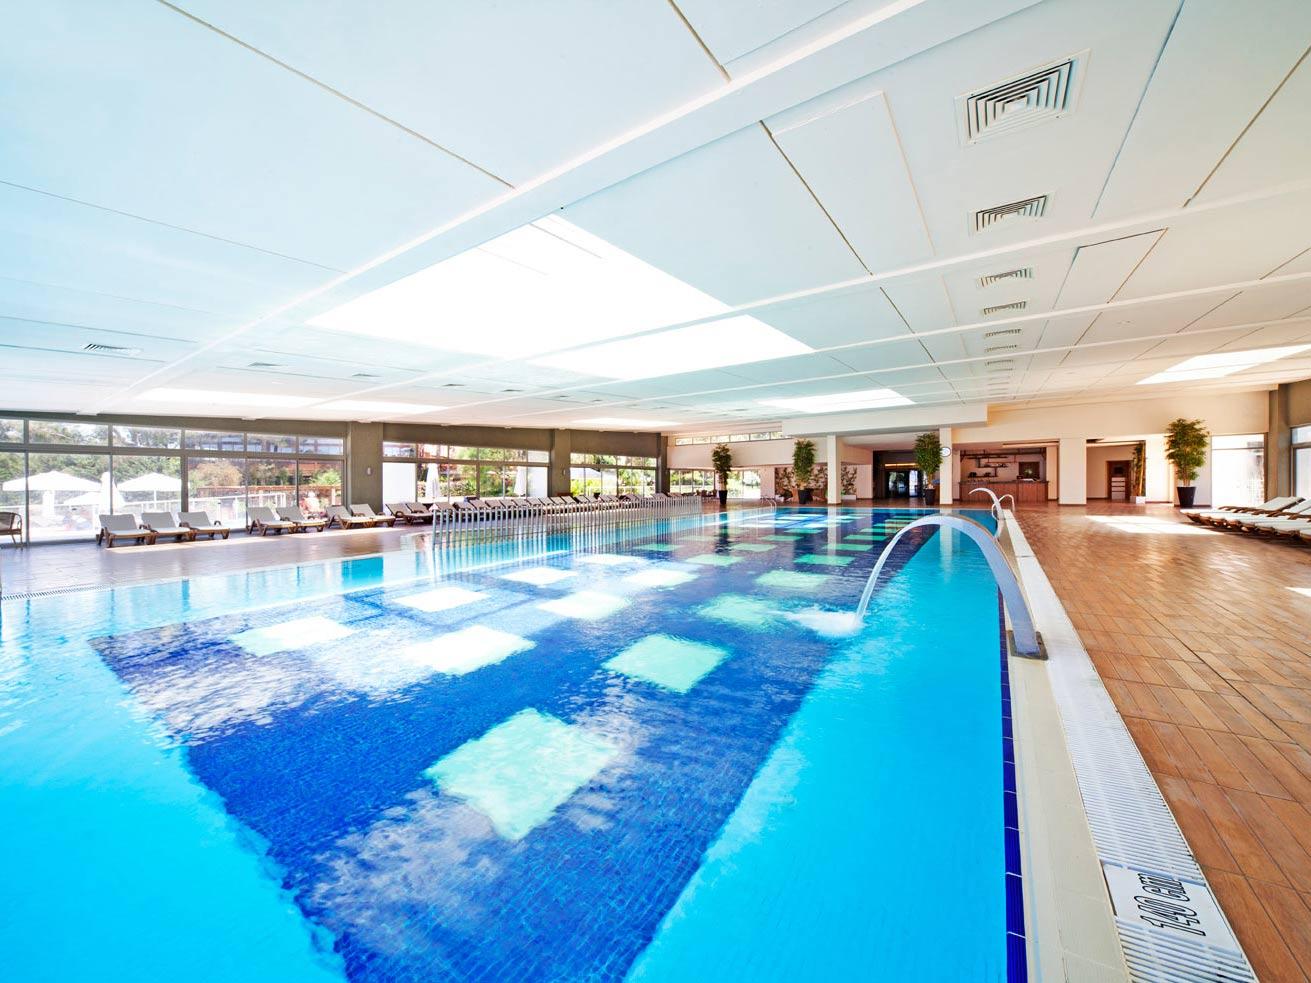 sueno hotels beach side pools indoor